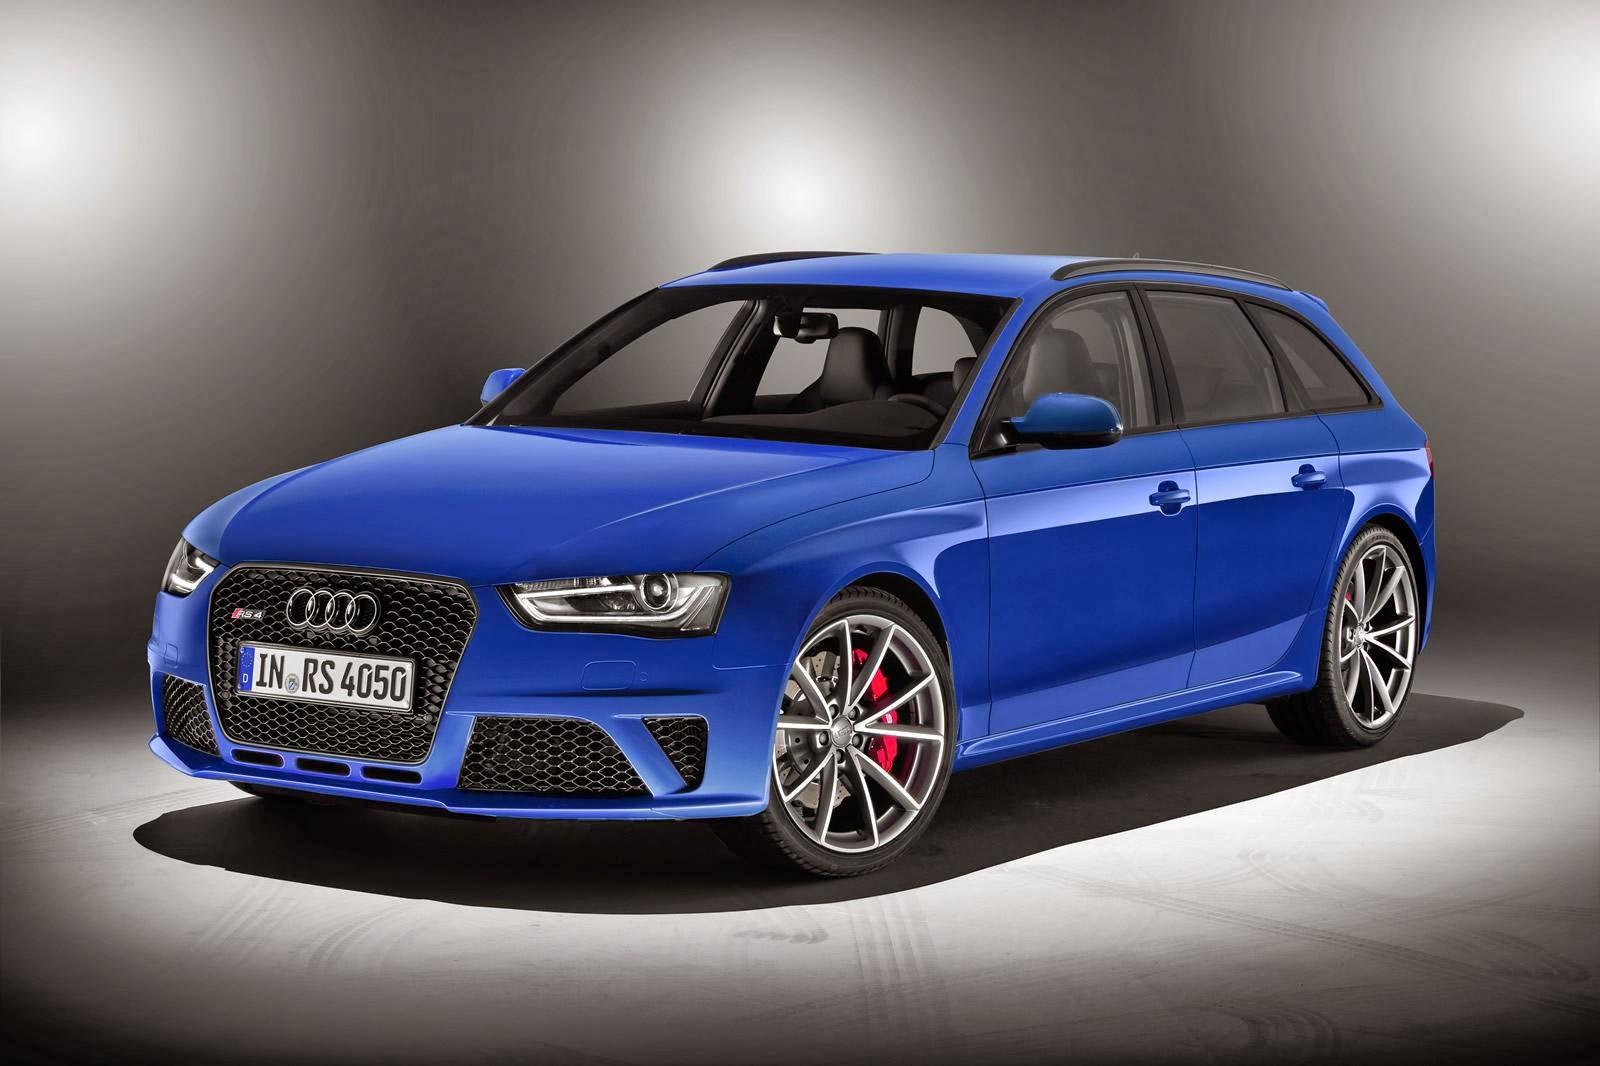 [Resim: Audi+RS4+Avant+Nogaro+selection+1.jpg]